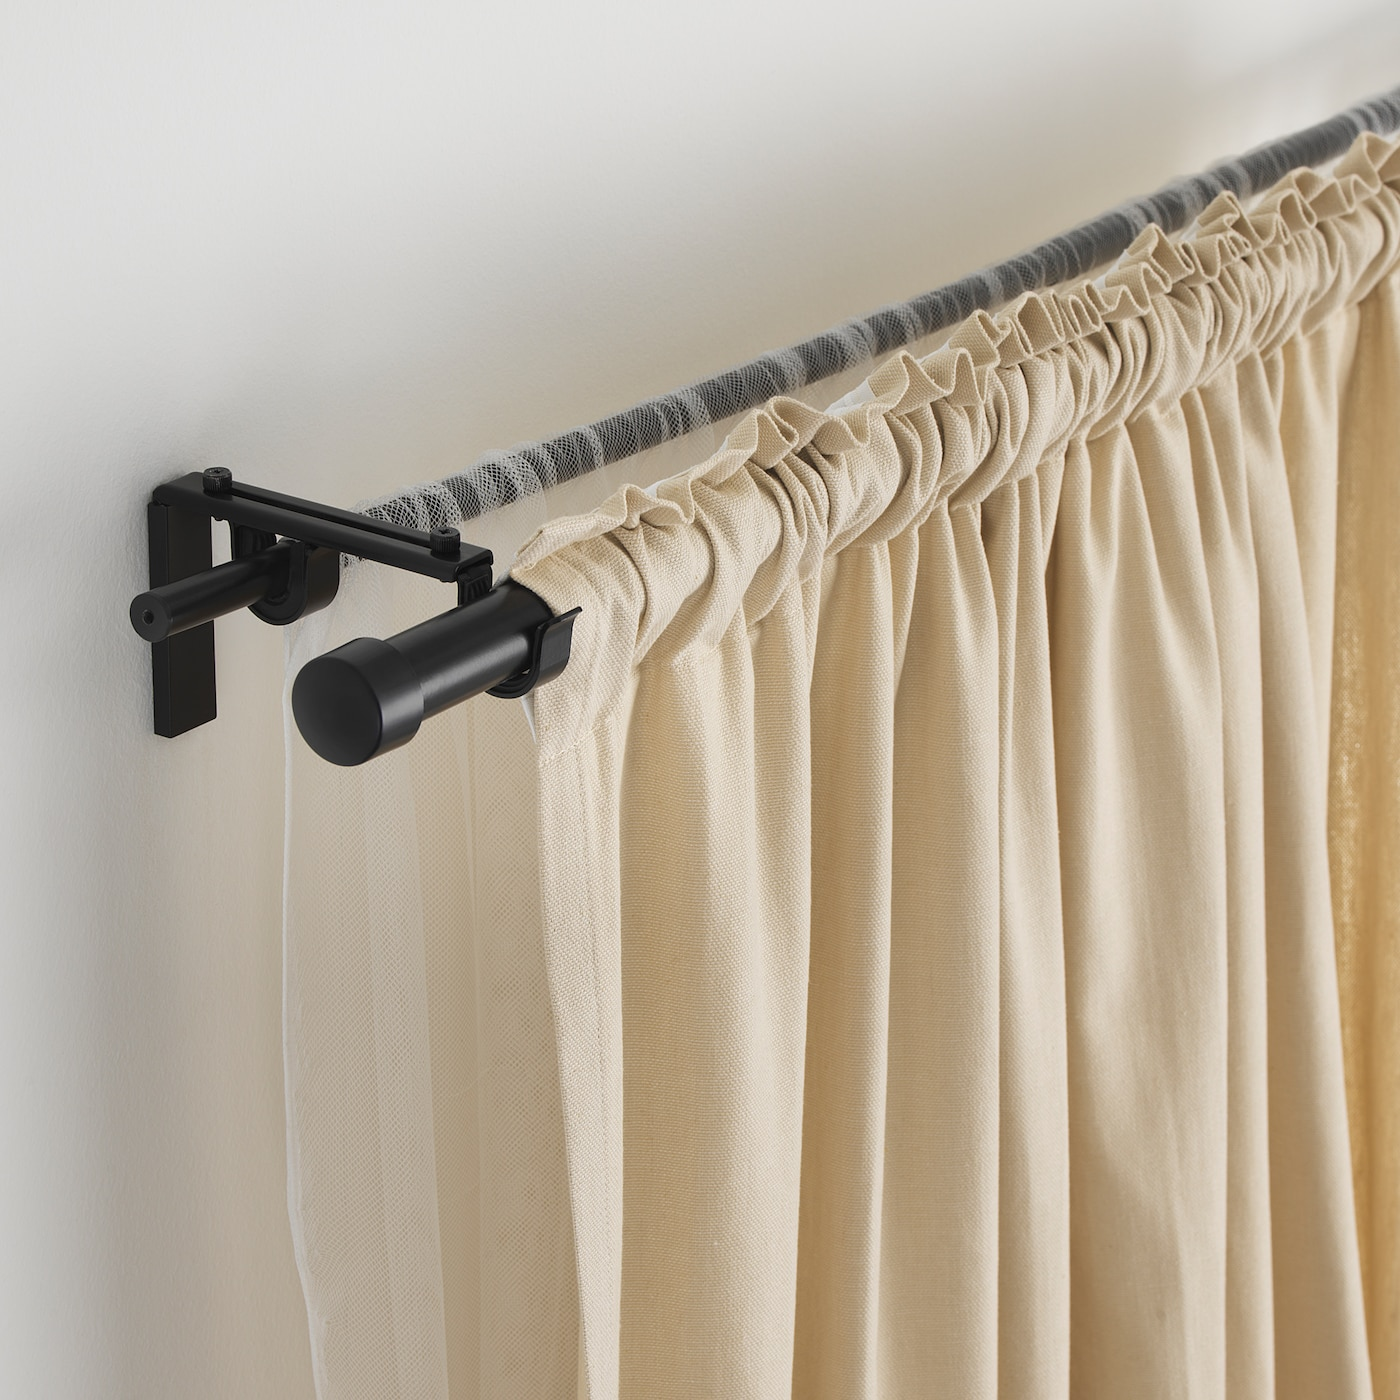 Racka Hugad Black Double Curtain Rod Combination Ikea